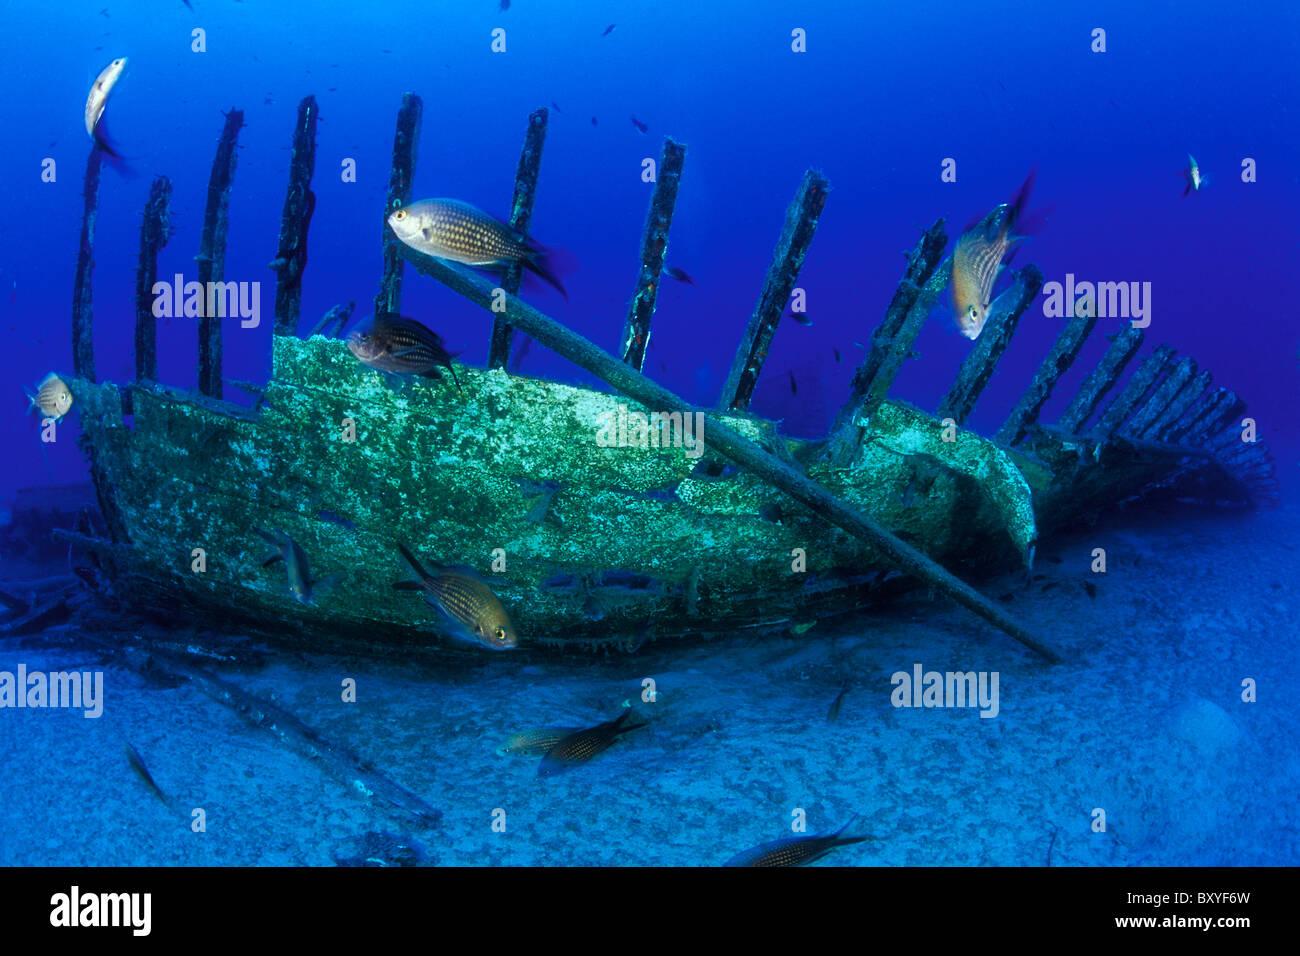 Mavi Wreck, Kas en Antalya, Turquía, el Mar Mediterráneo Imagen De Stock